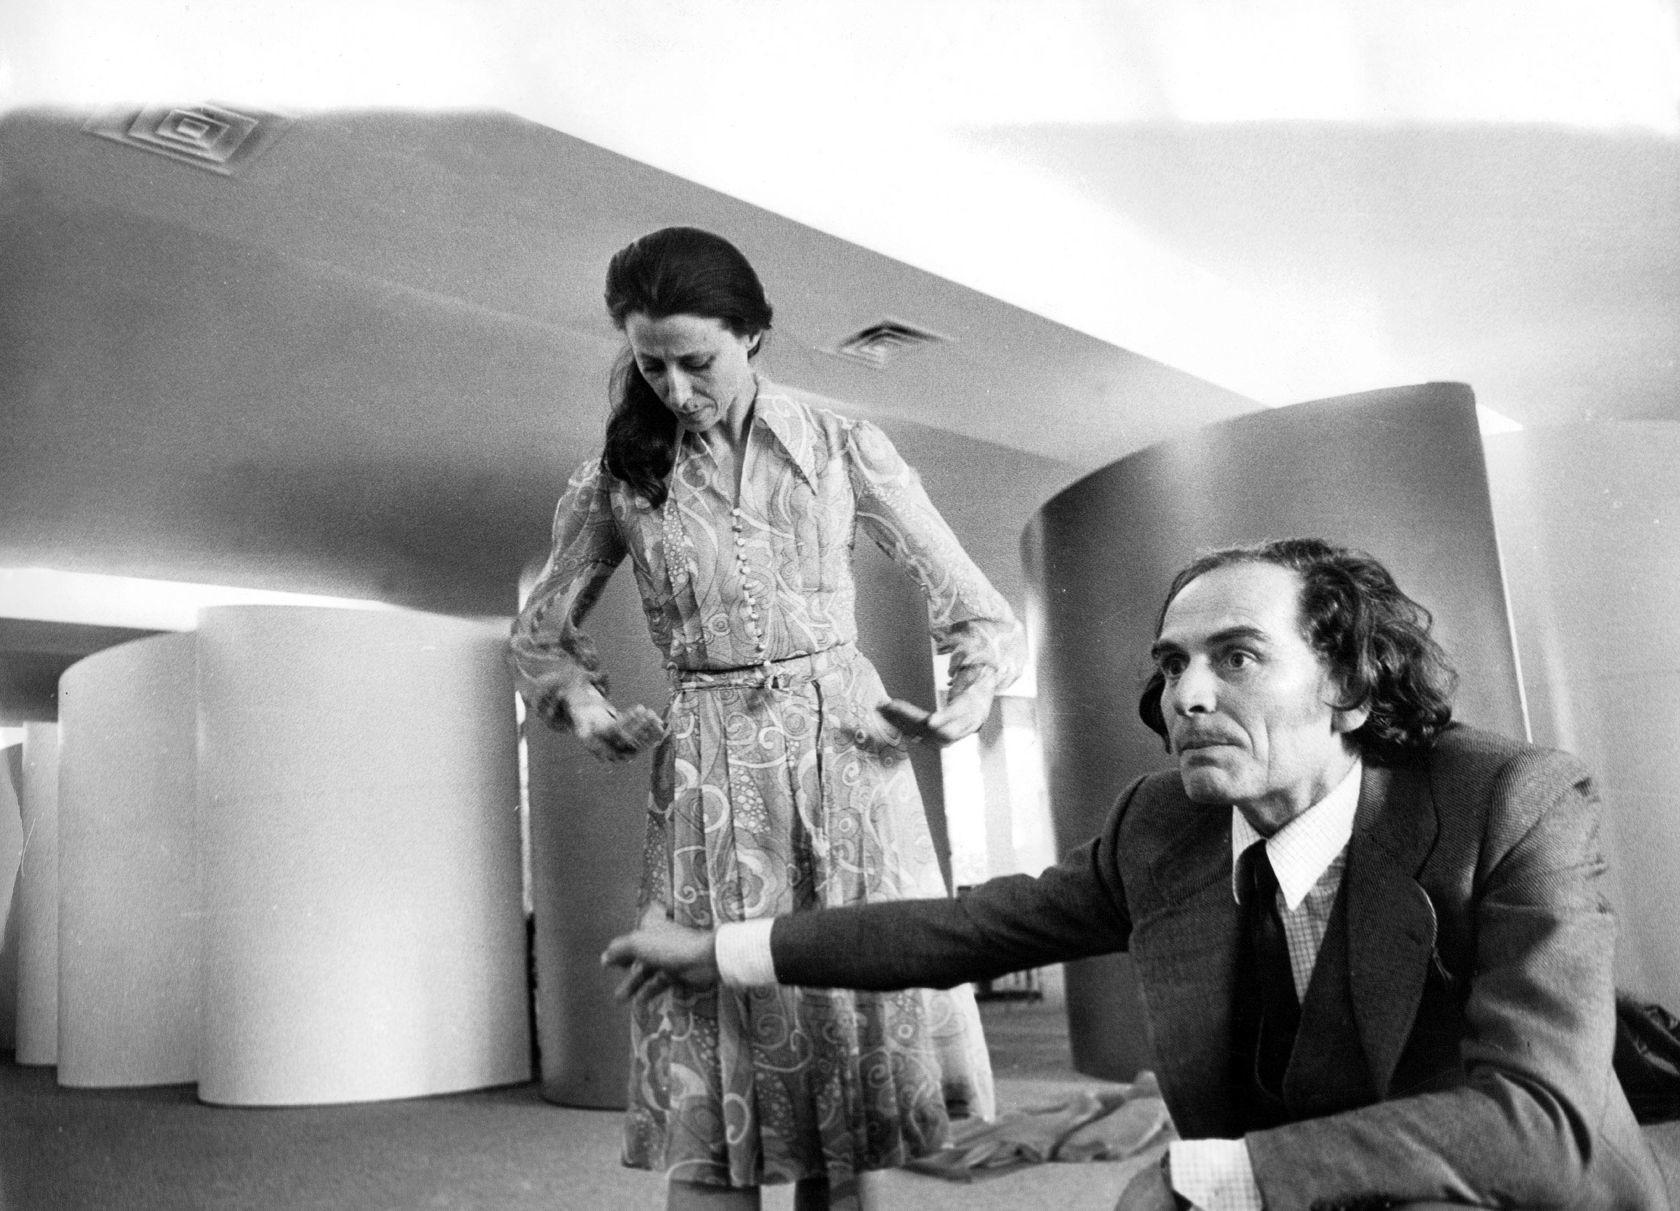 La bailarina Maya Plisétskaya y Pierre Cardin